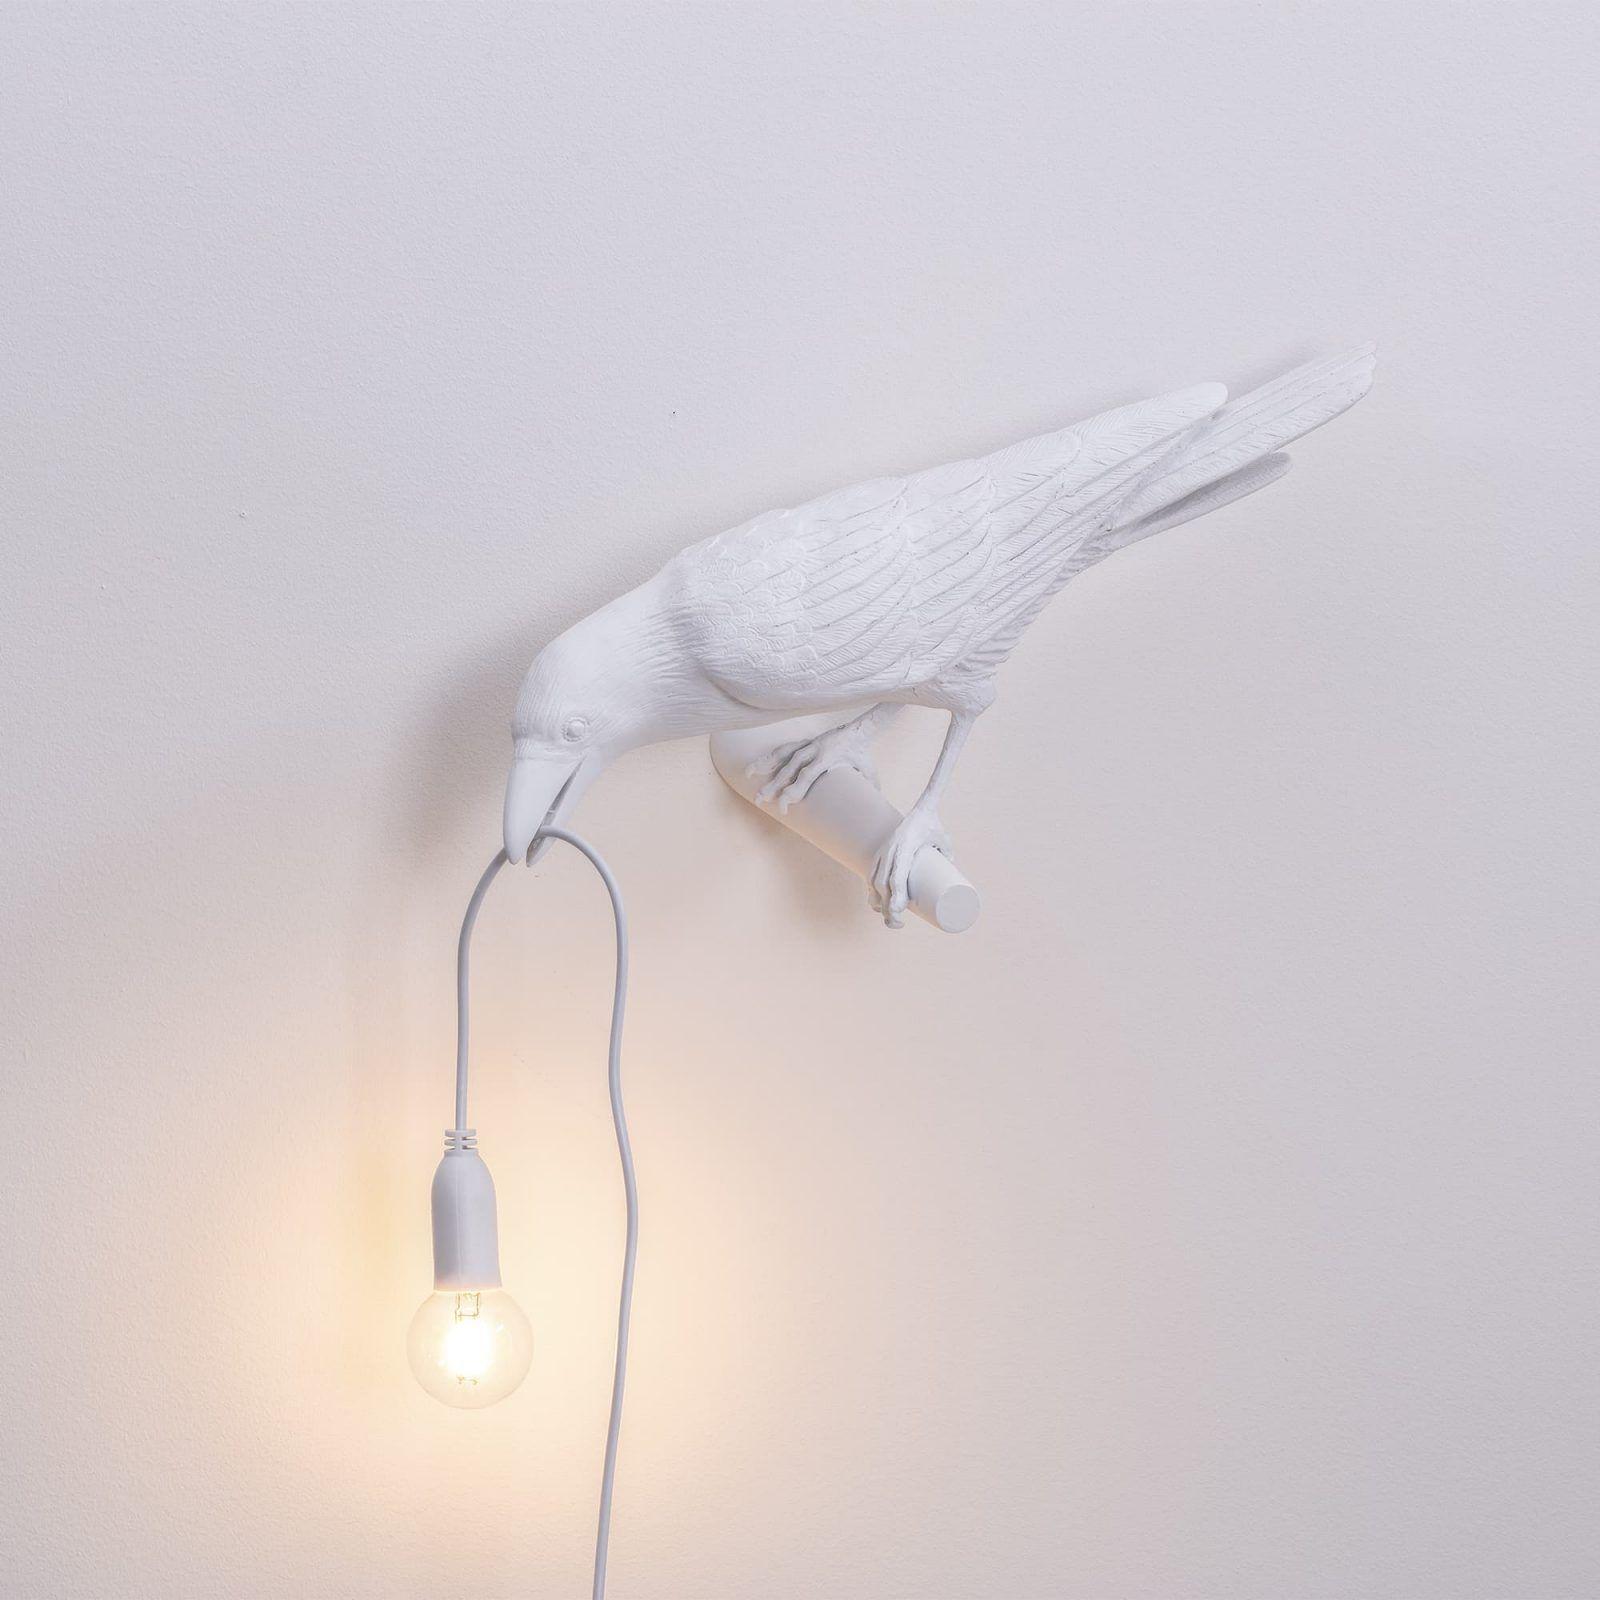 Bird Lamp Looking, White